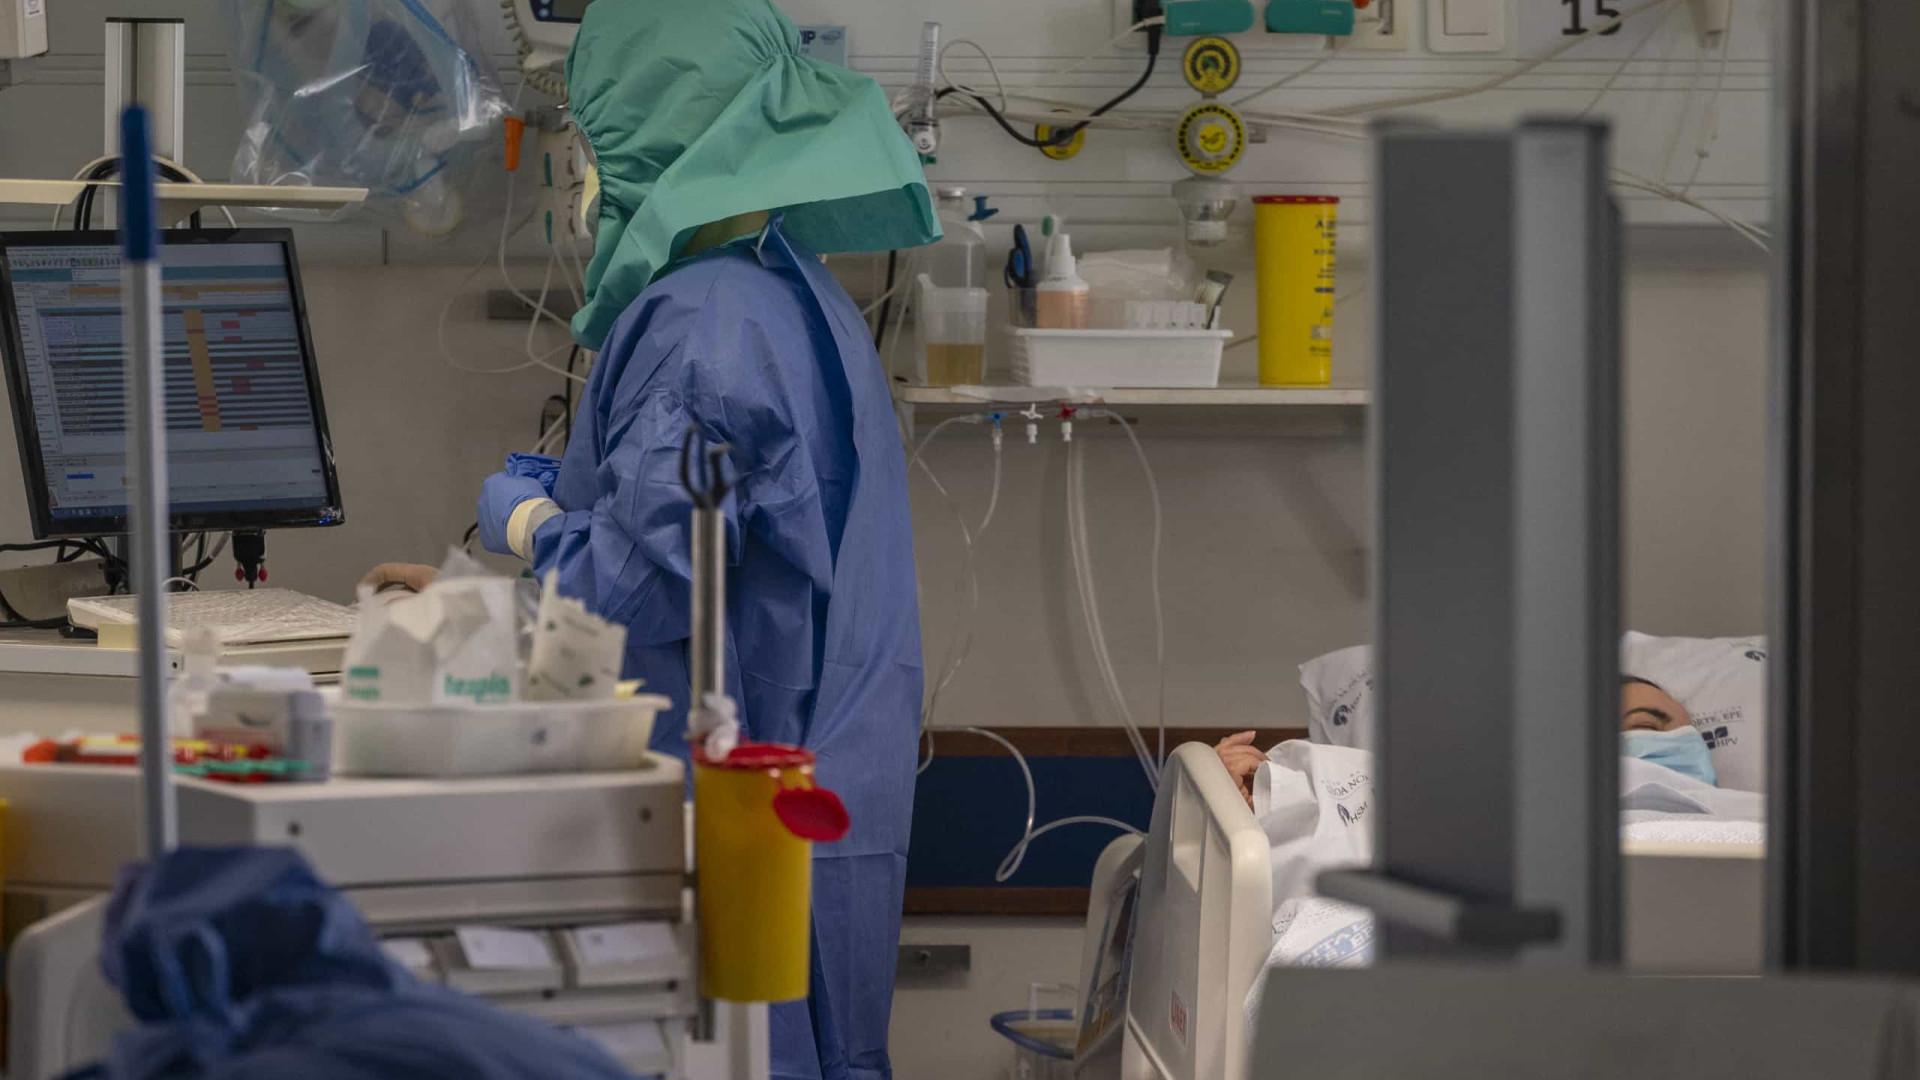 Especialista alerta: Medo de perder salário leva doentes a esconder Covid